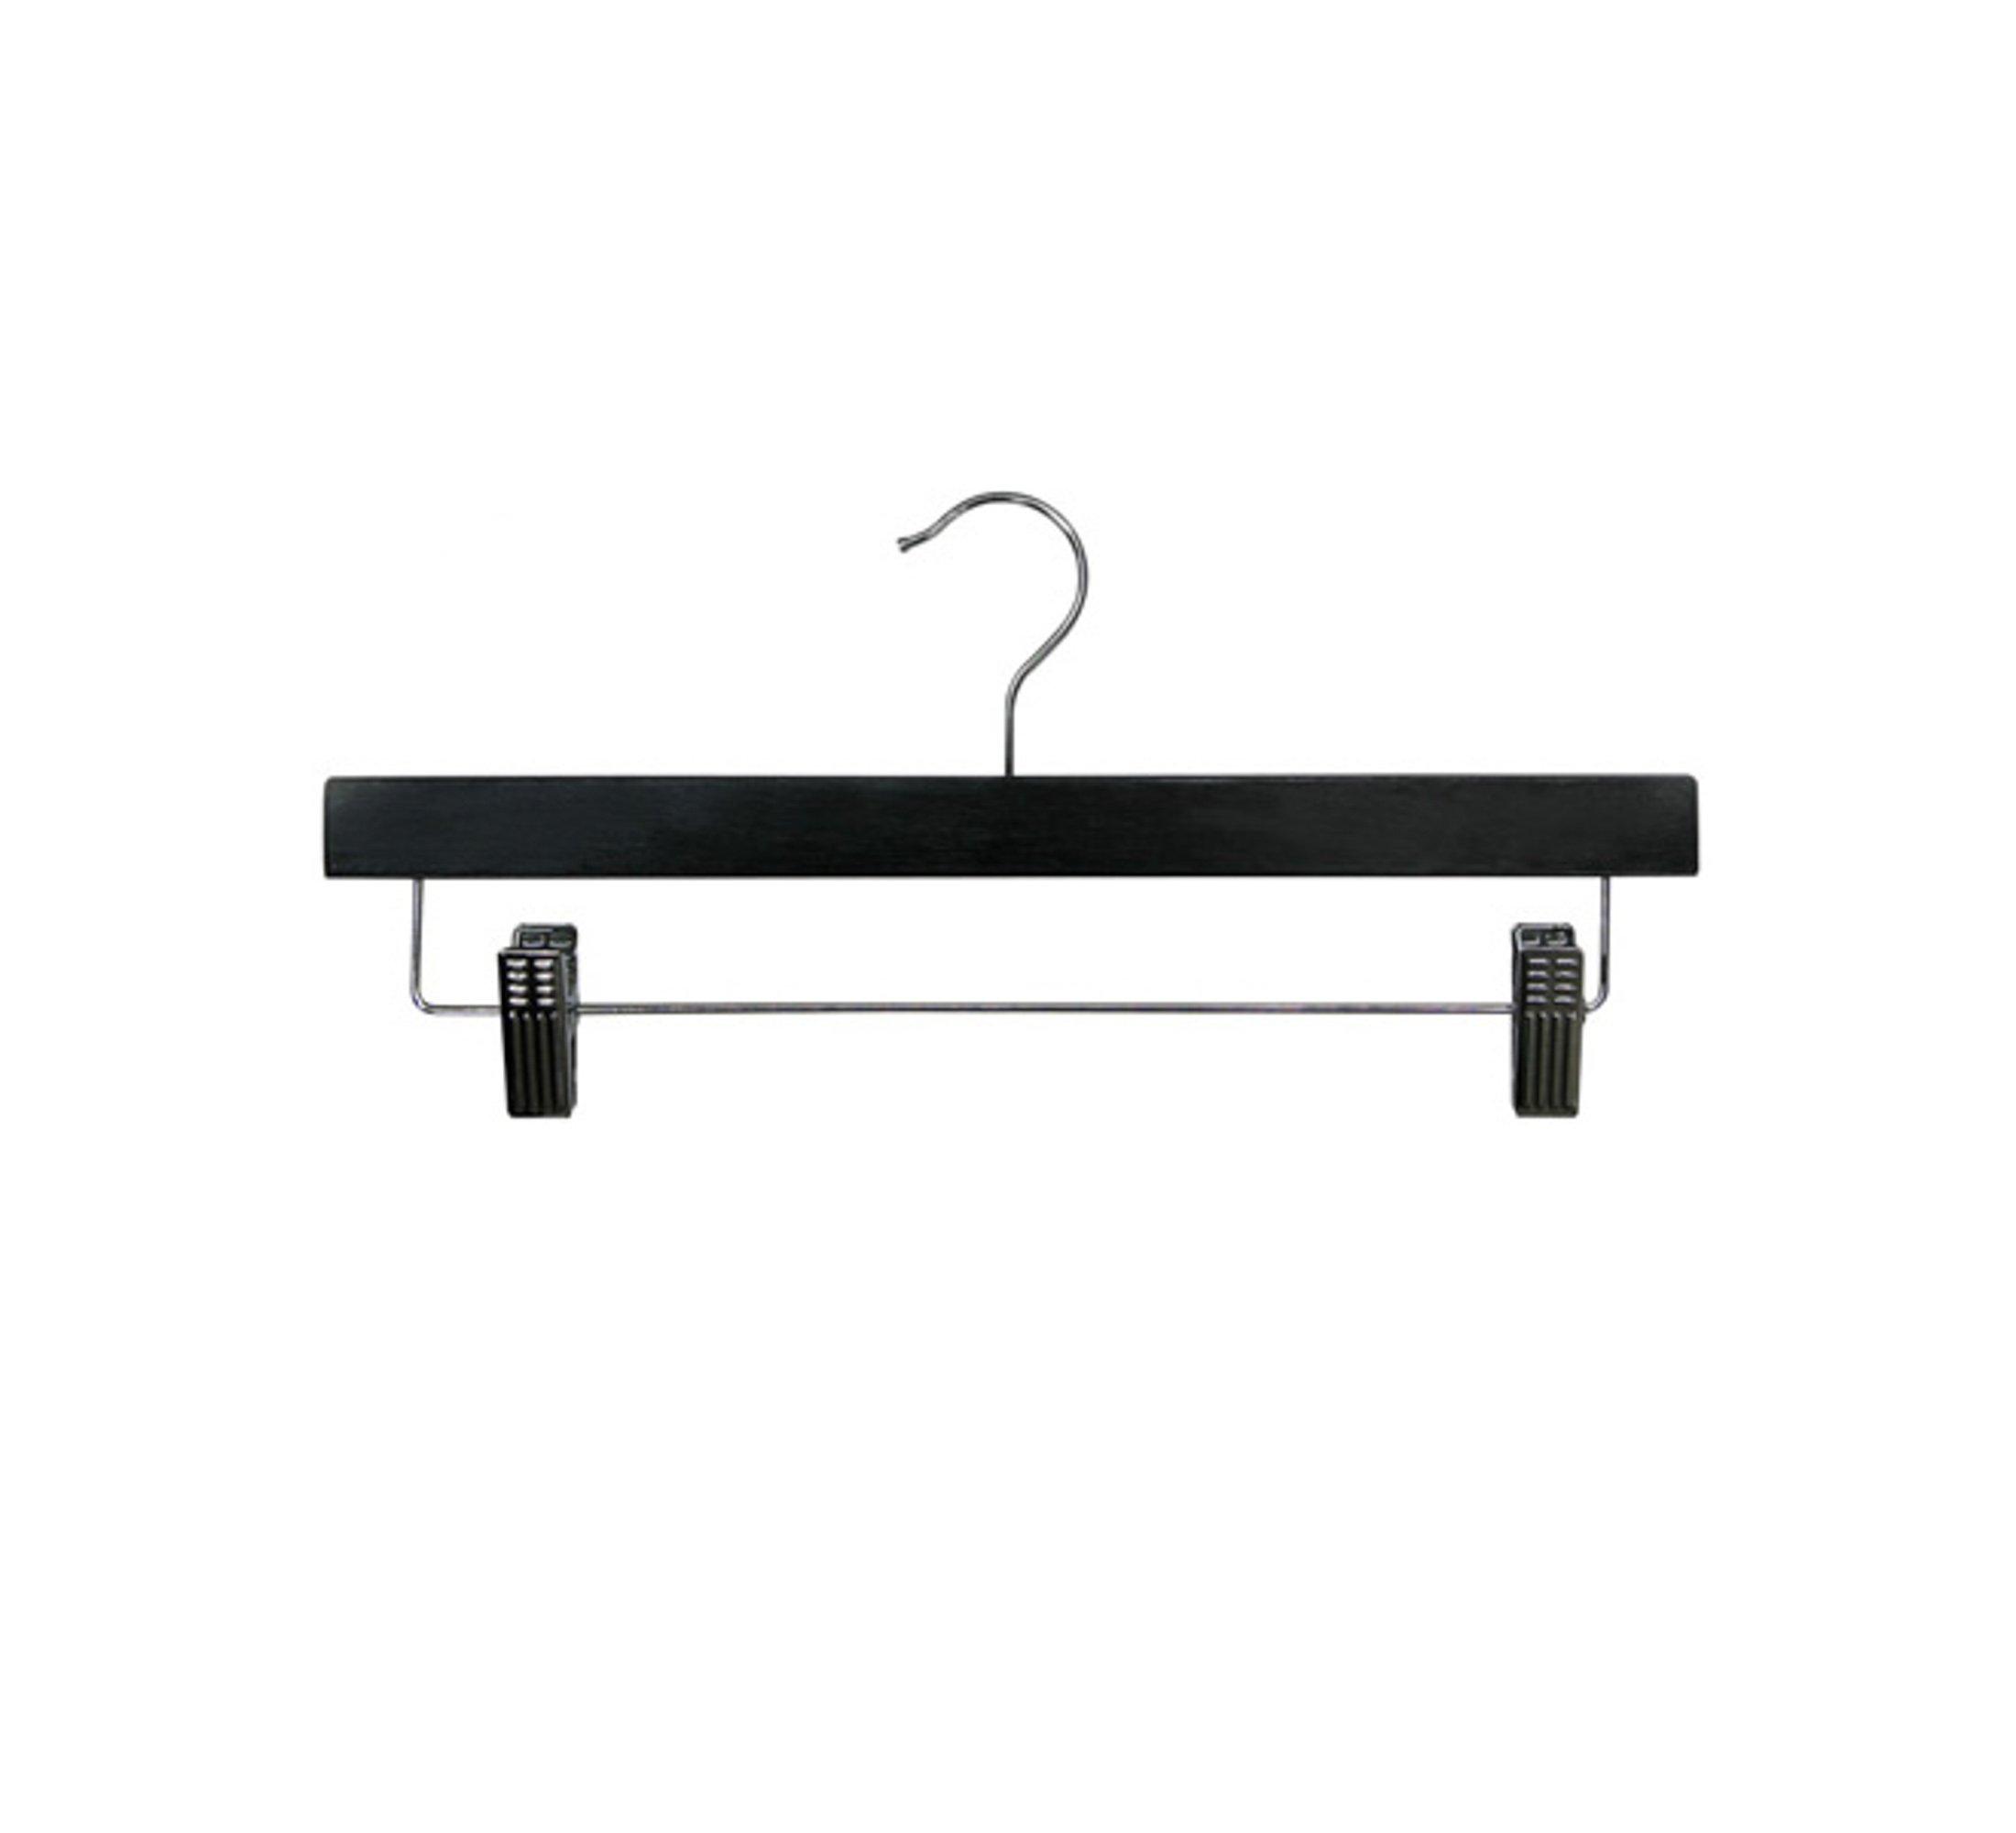 Newtech Display HWB-14/BLK Pants/Skirt Wood Hanger, Black (Pack of 100)